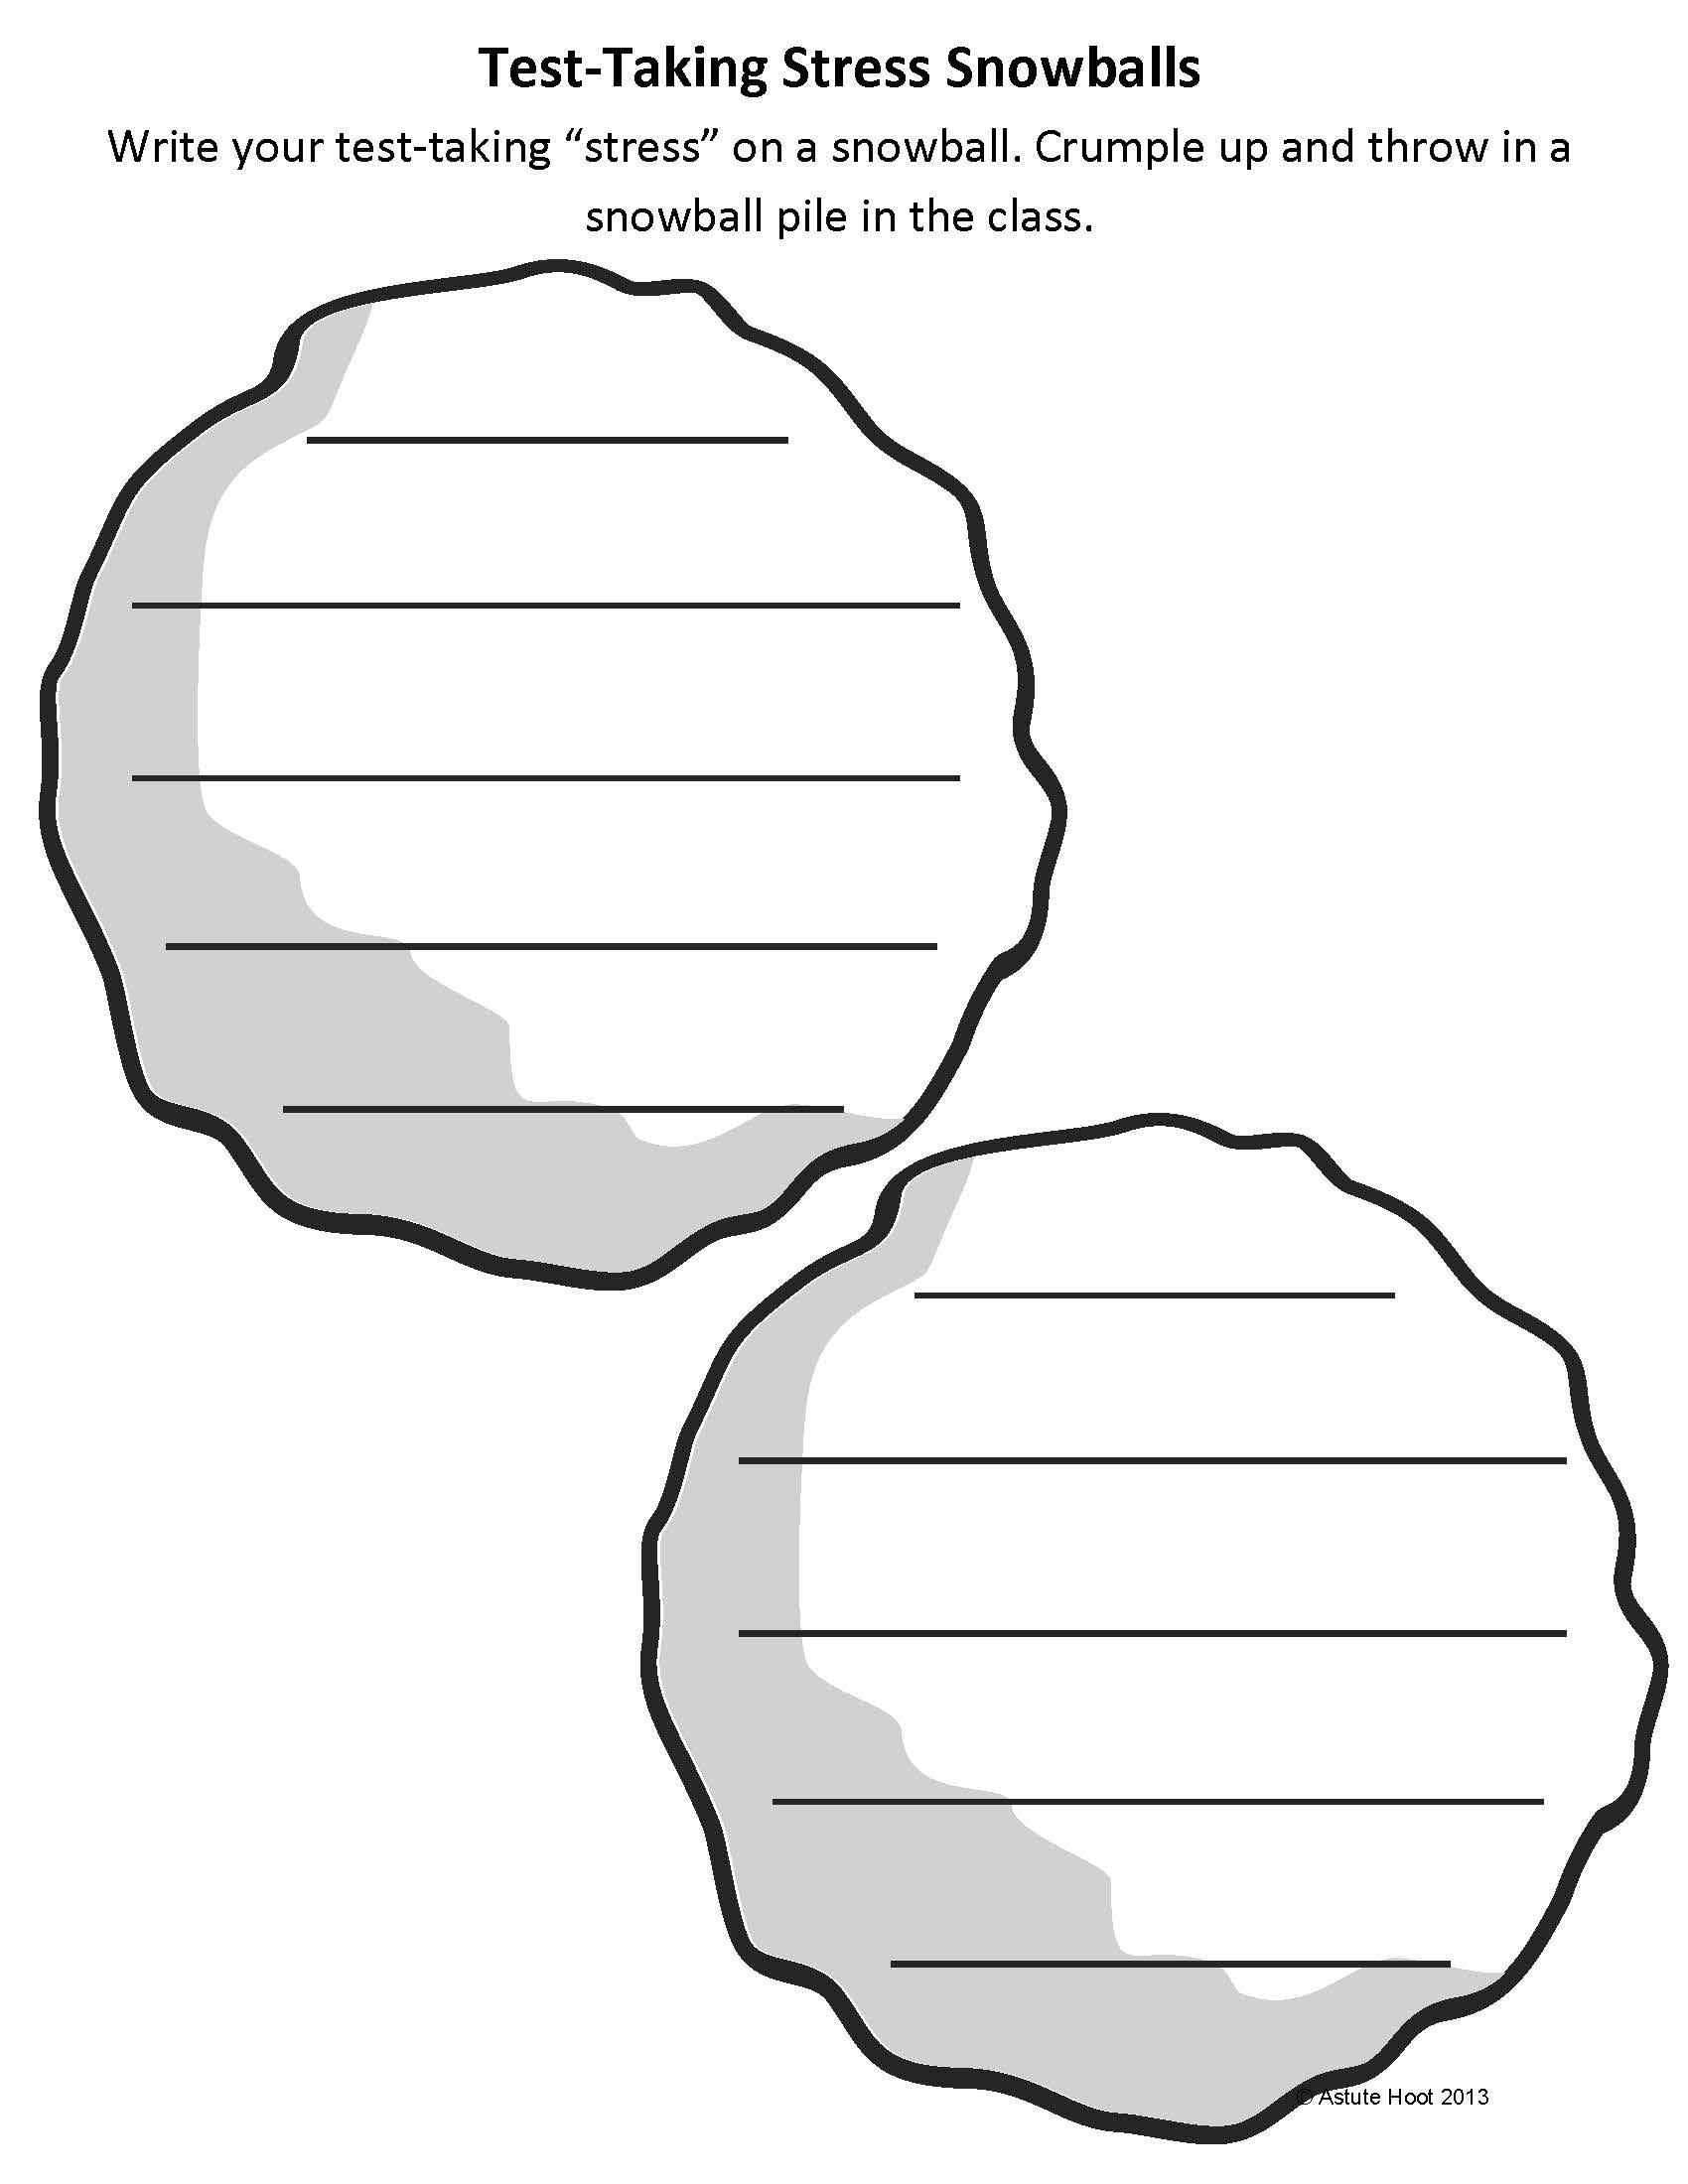 Stress snowballs paper